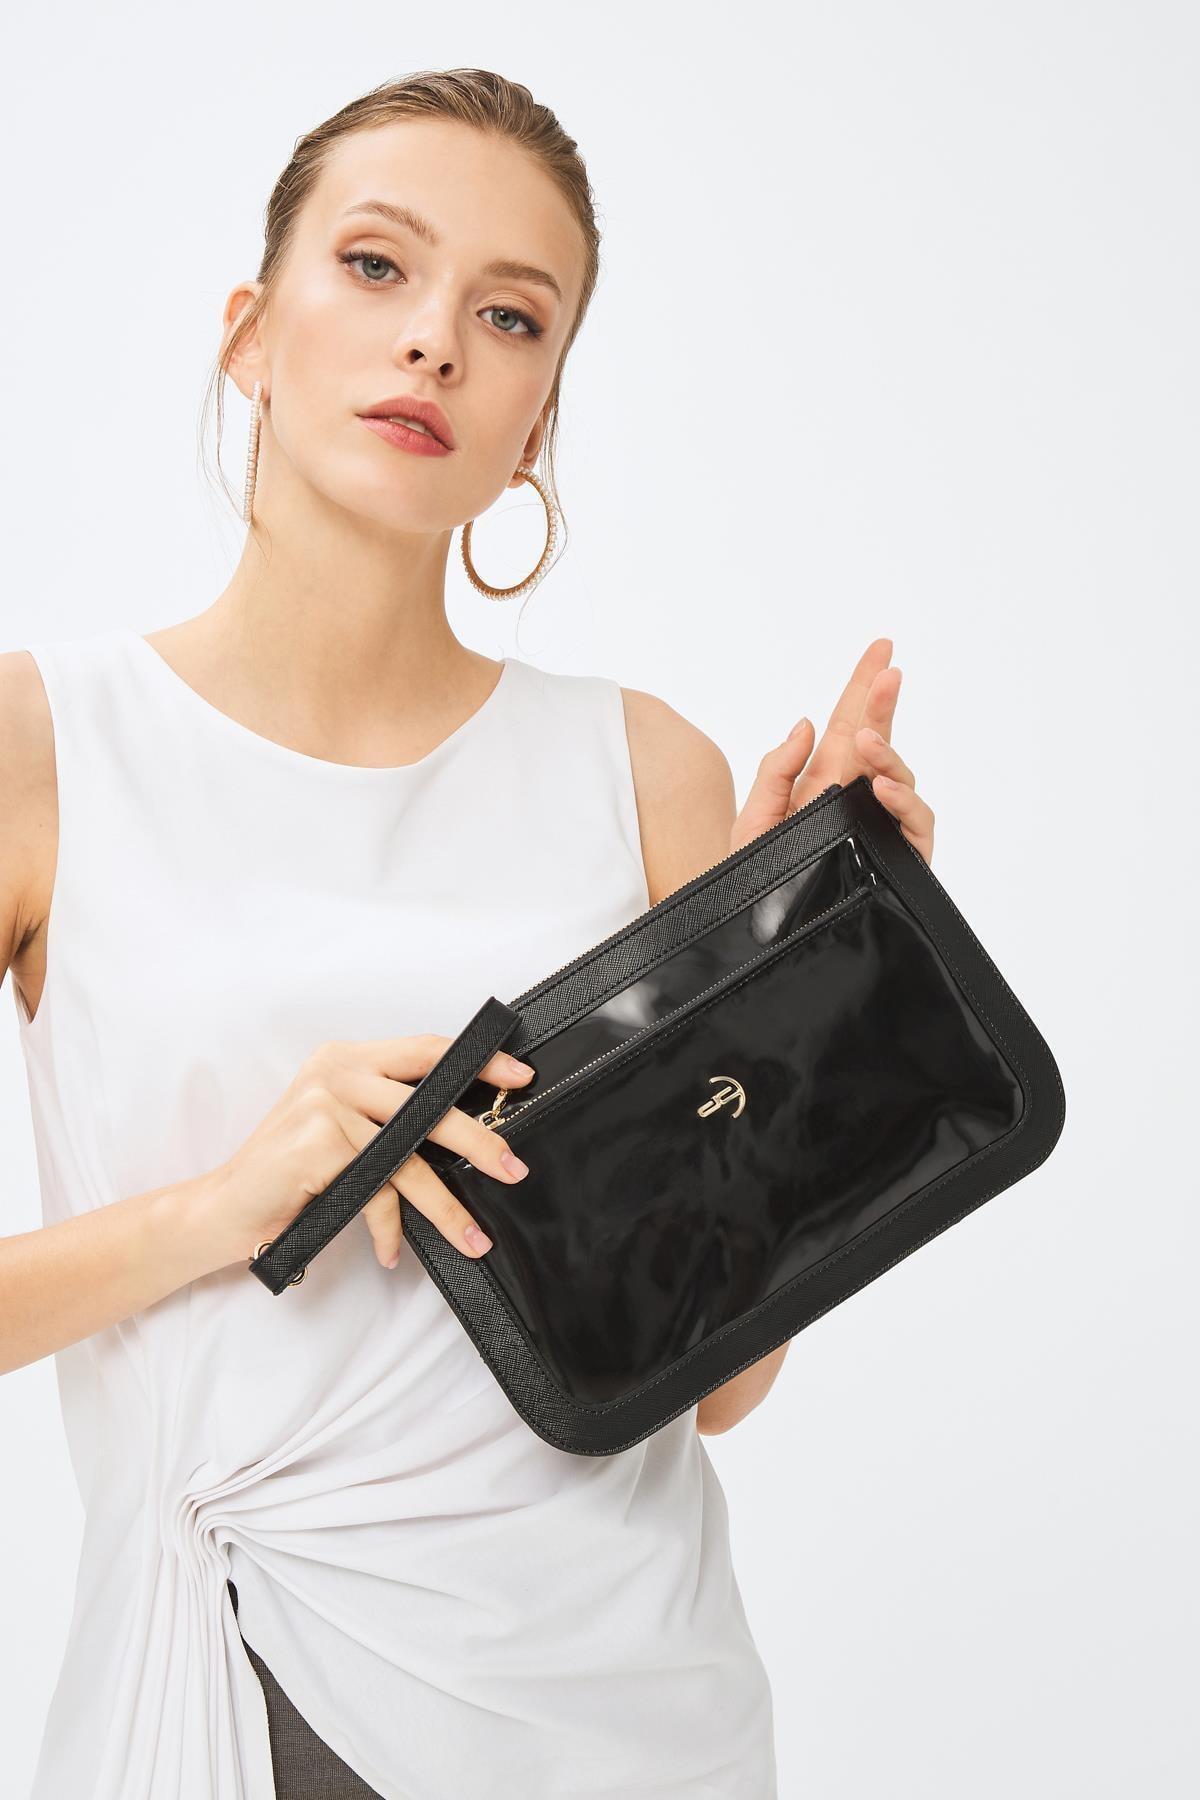 Deri Company Kadın Basic Clutch Çanta Rugan Siyah 214003 2